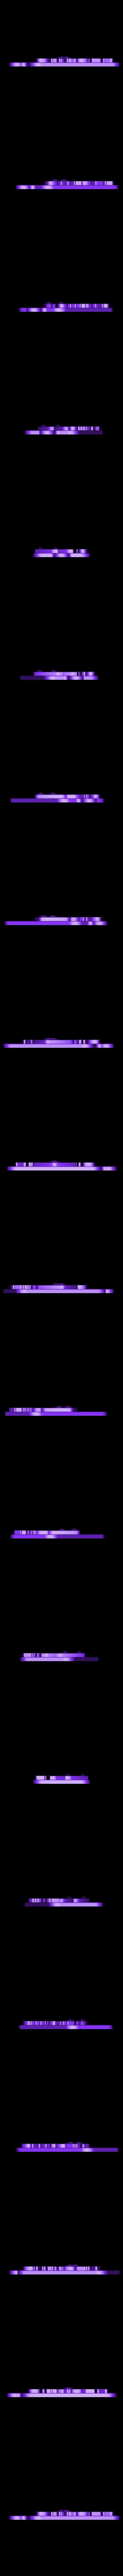 Citroen.STL Download STL file Citroen key ring • Design to 3D print, nldise